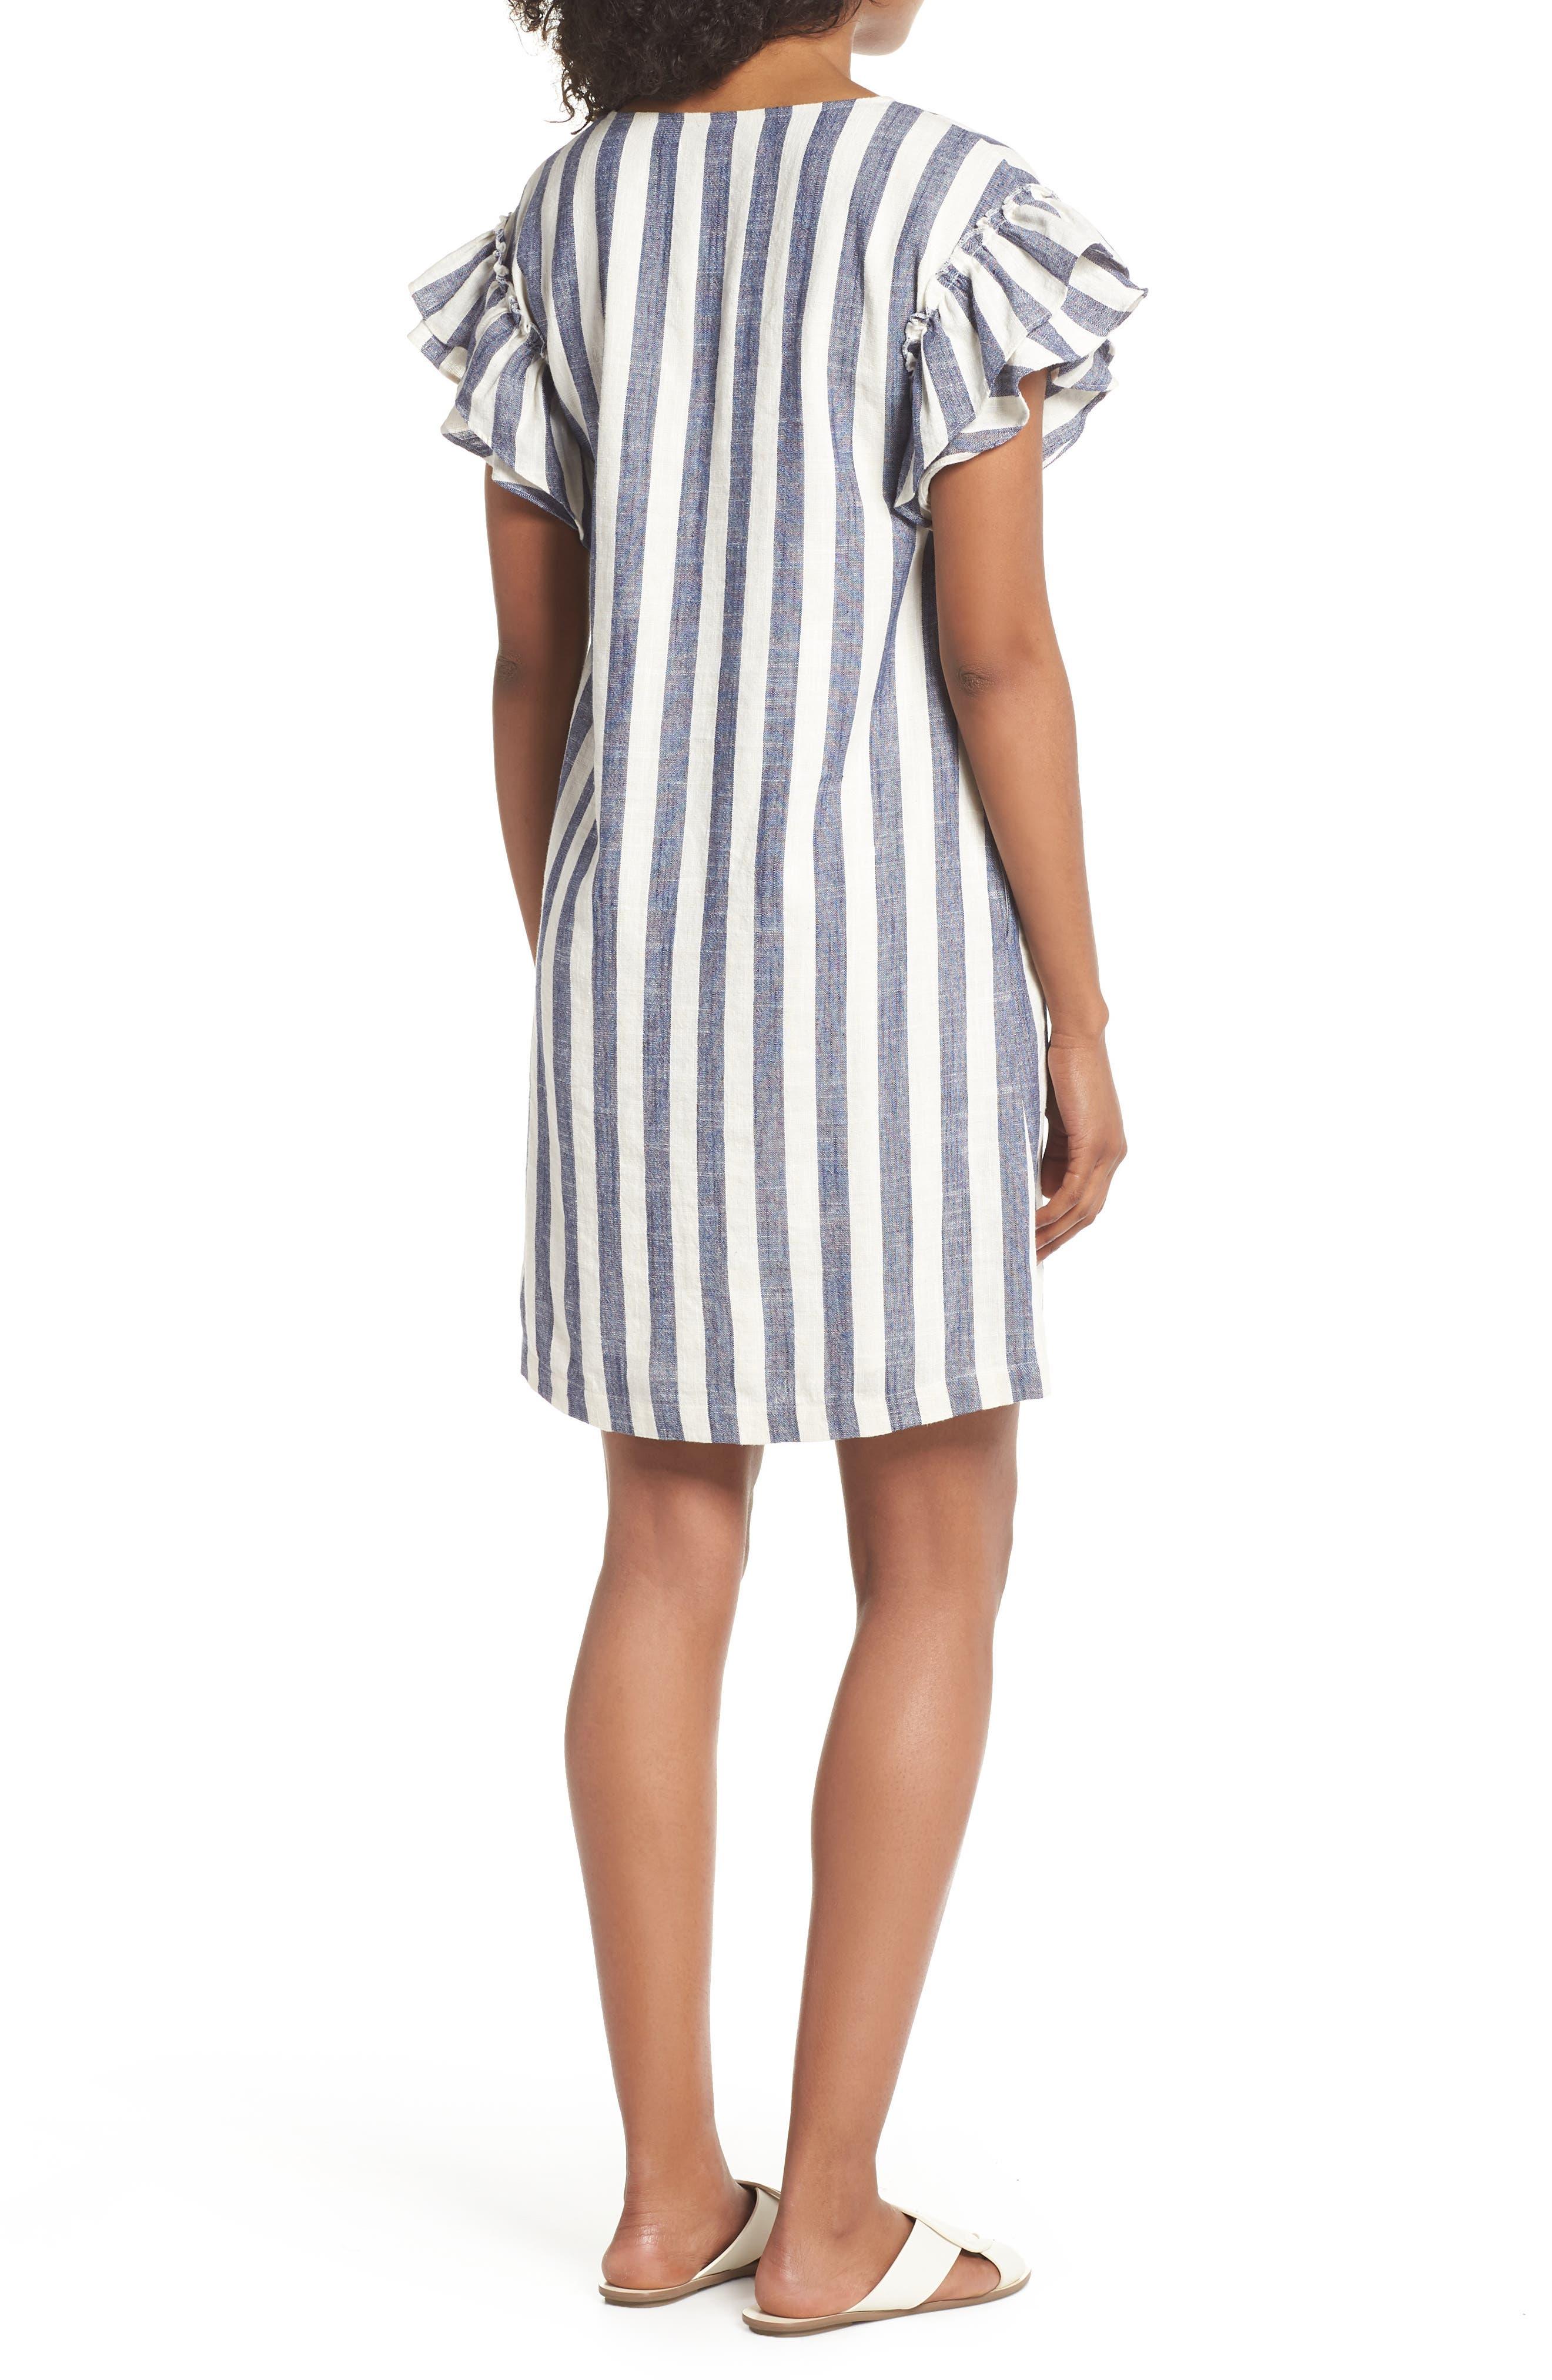 Ruffle Sleeve Shift Dress,                             Alternate thumbnail 2, color,                             Navy-White